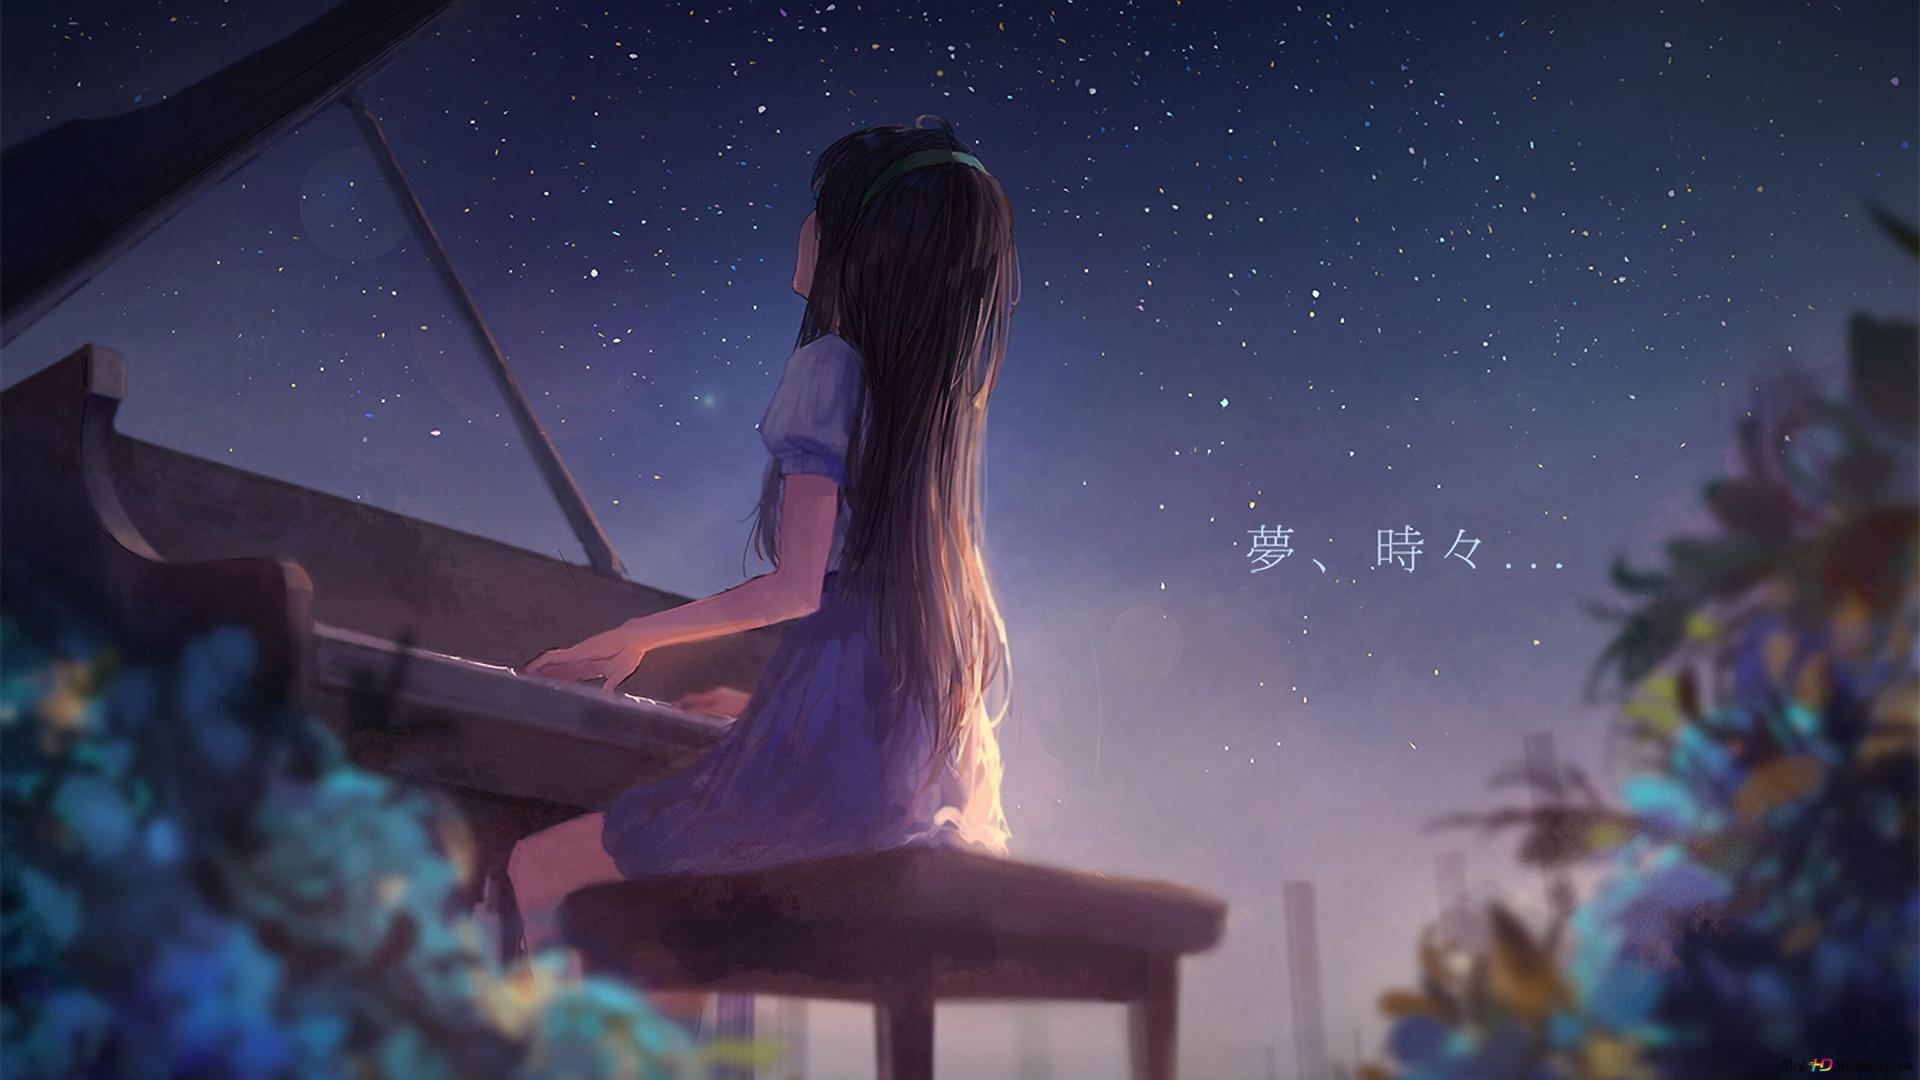 Piano And Girl Hd Wallpaper Download